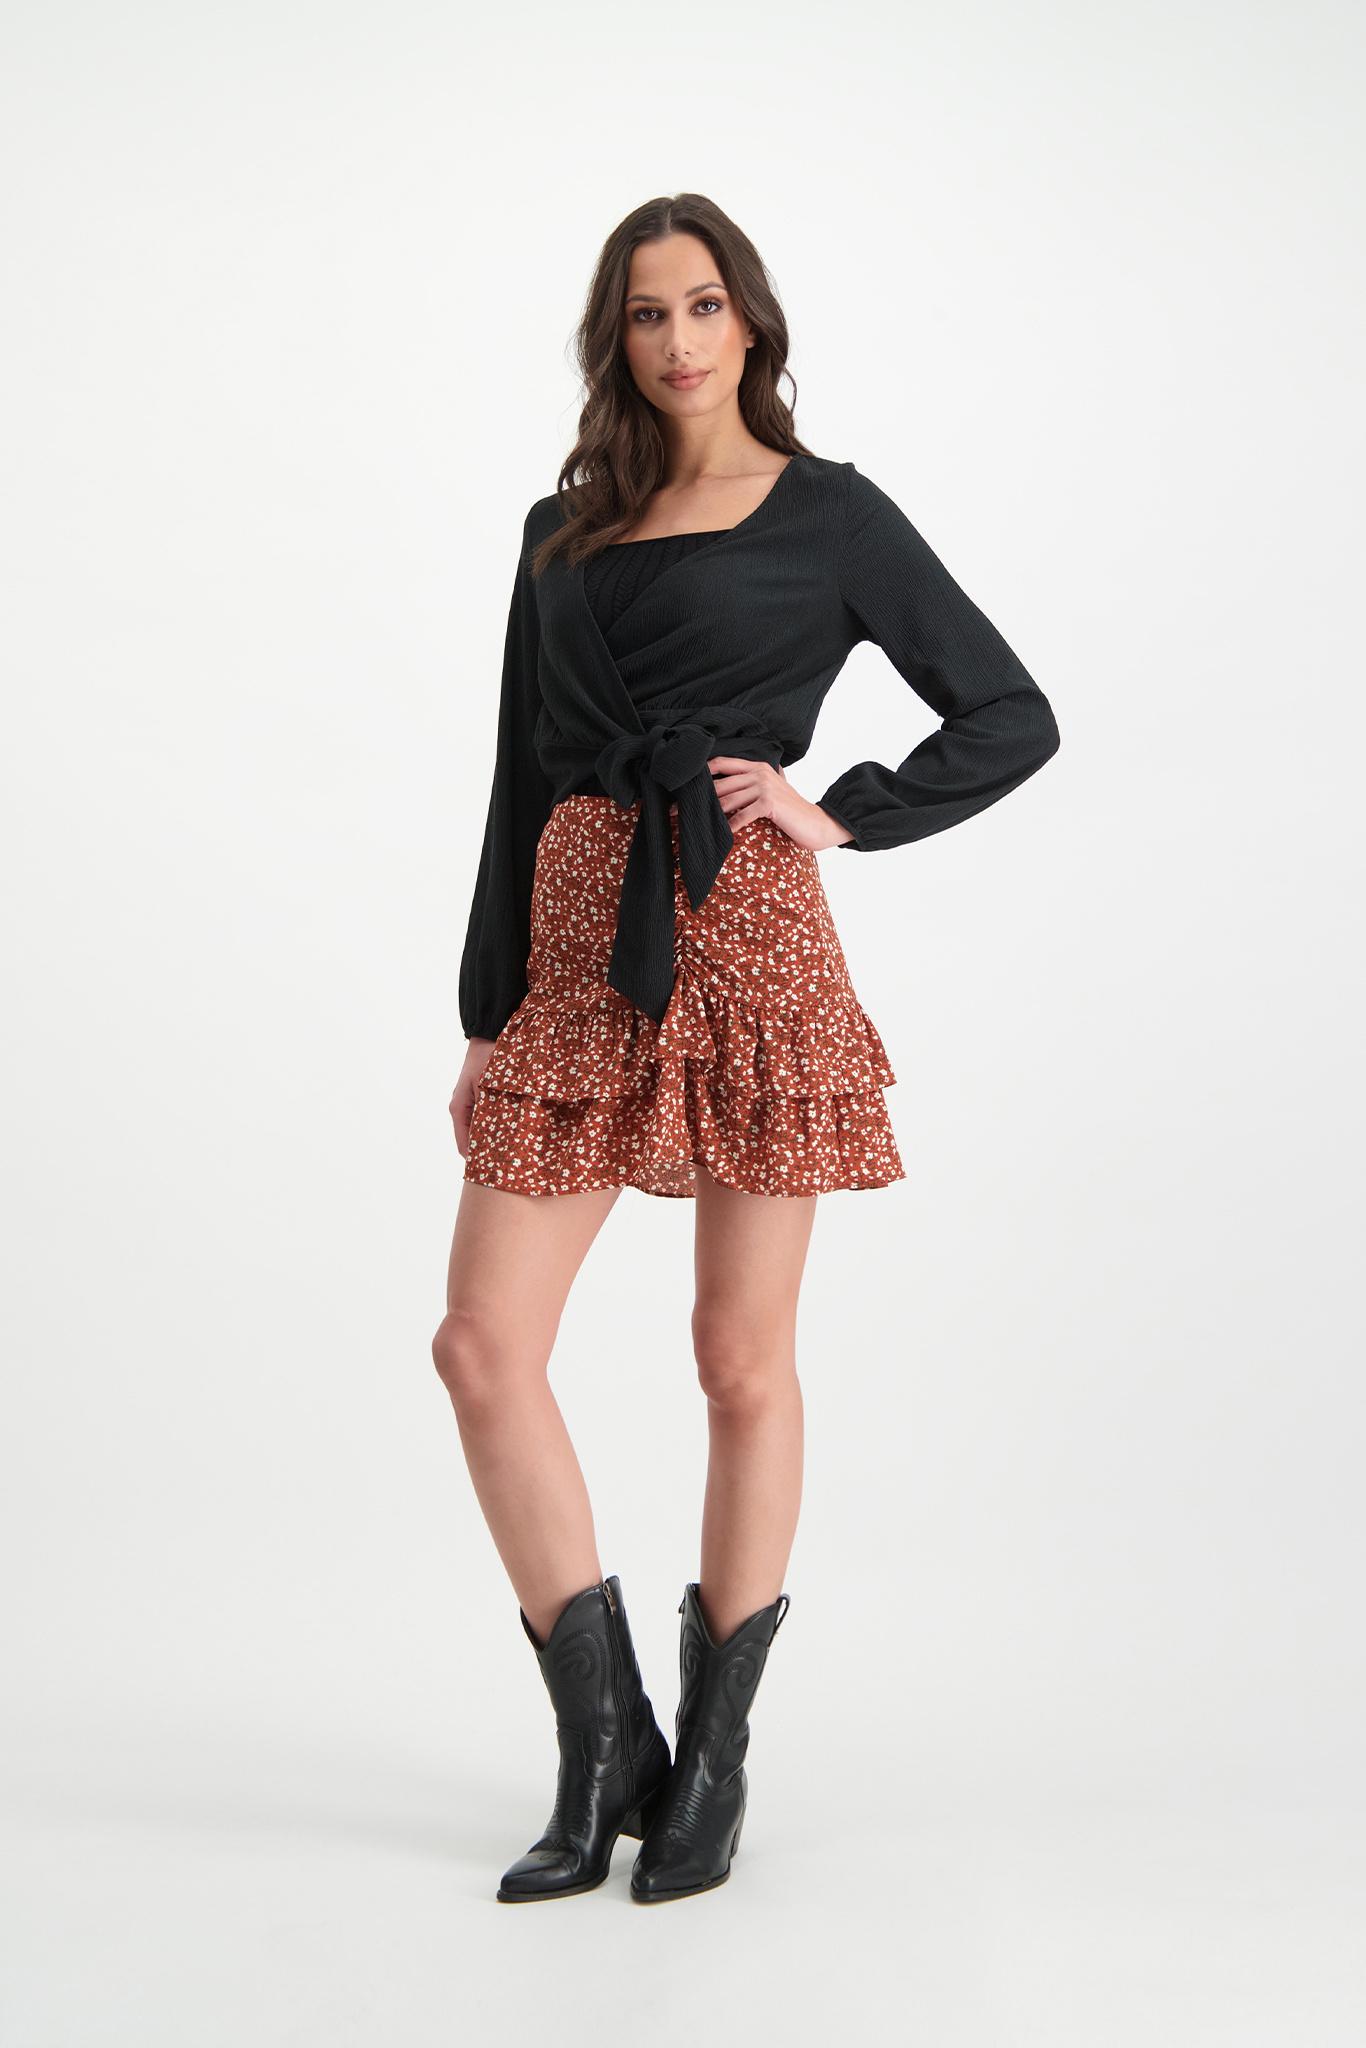 Lofty Manner Orange Floral Print Mini Skirt Ciara